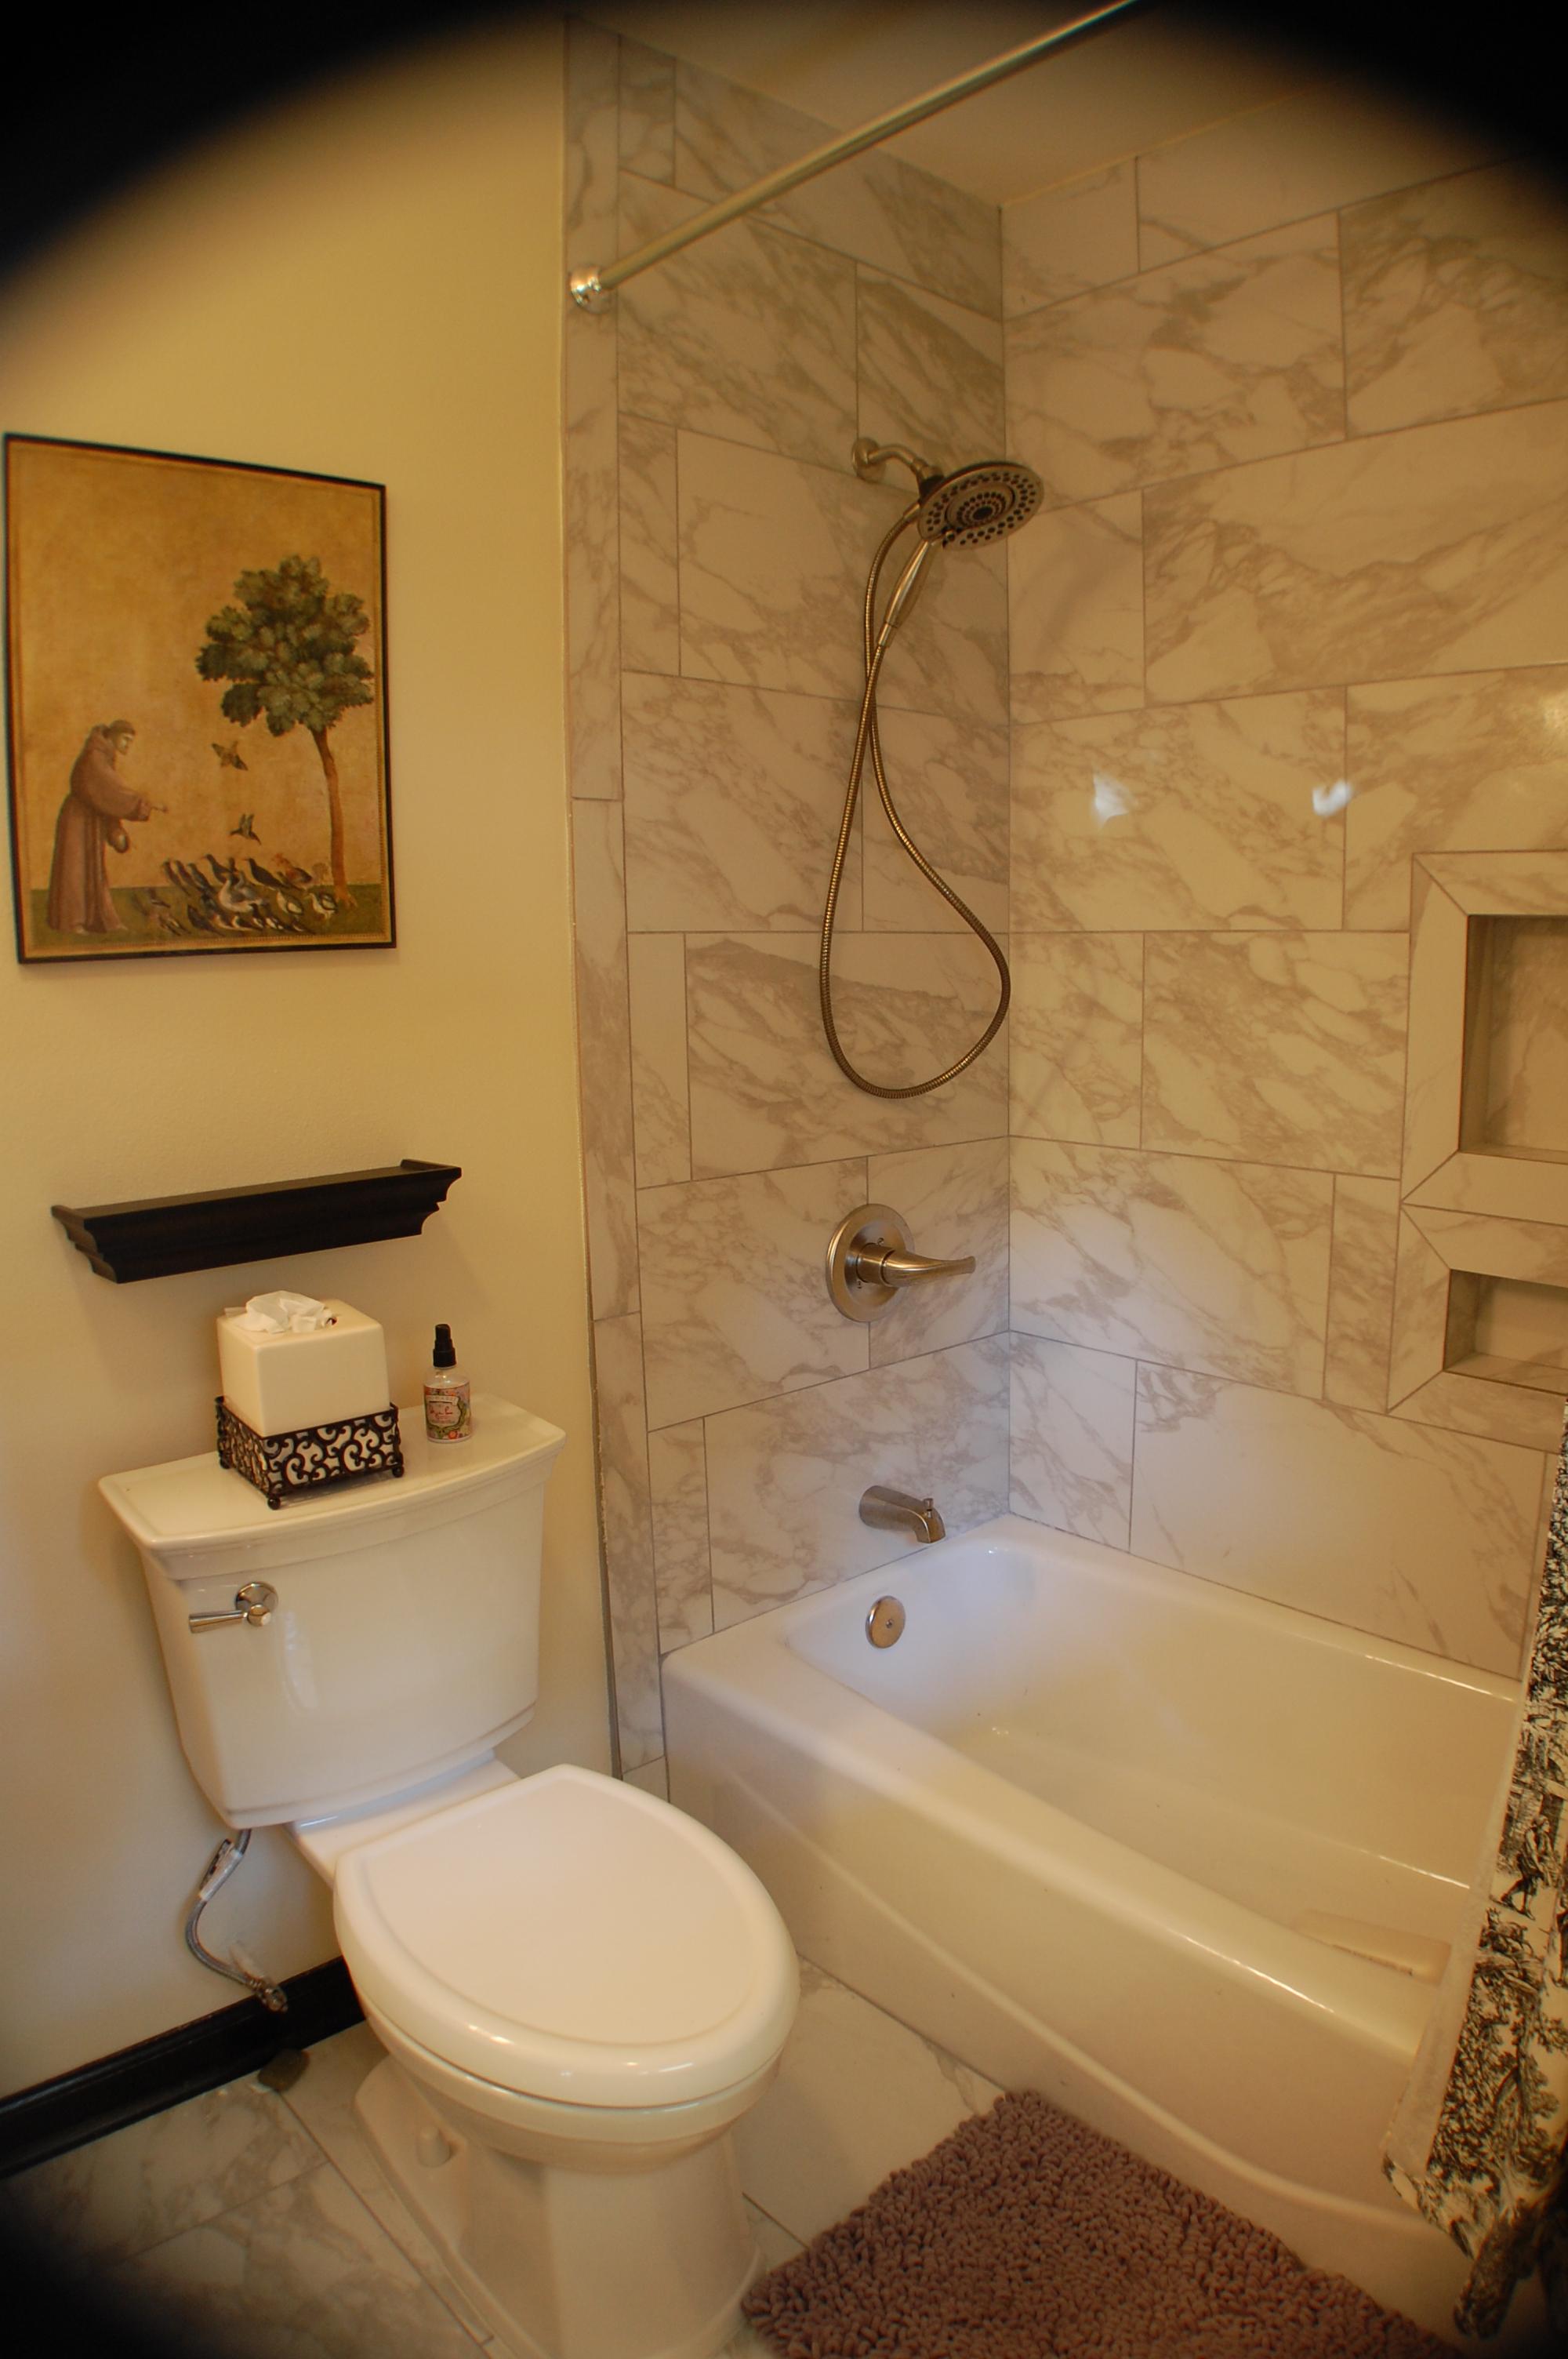 Westminster Master Bath and Hall Bath Renovation - Zitro ...